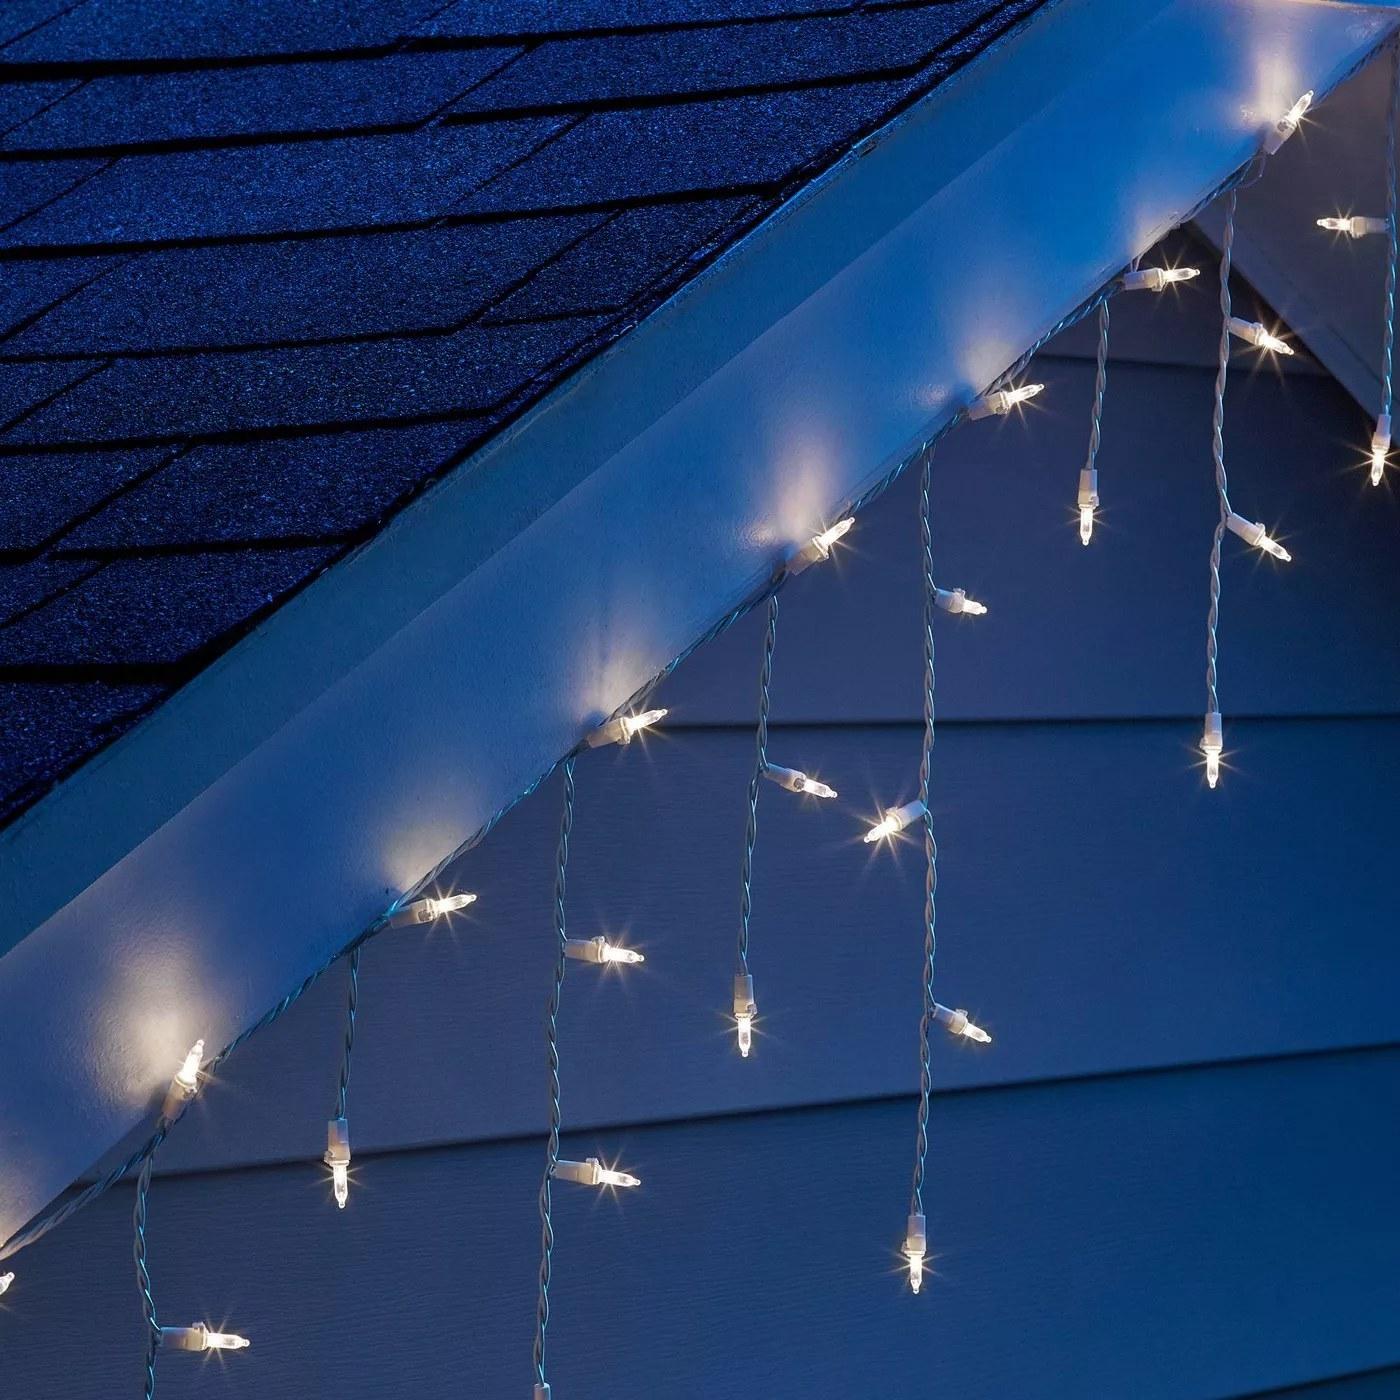 The string lights